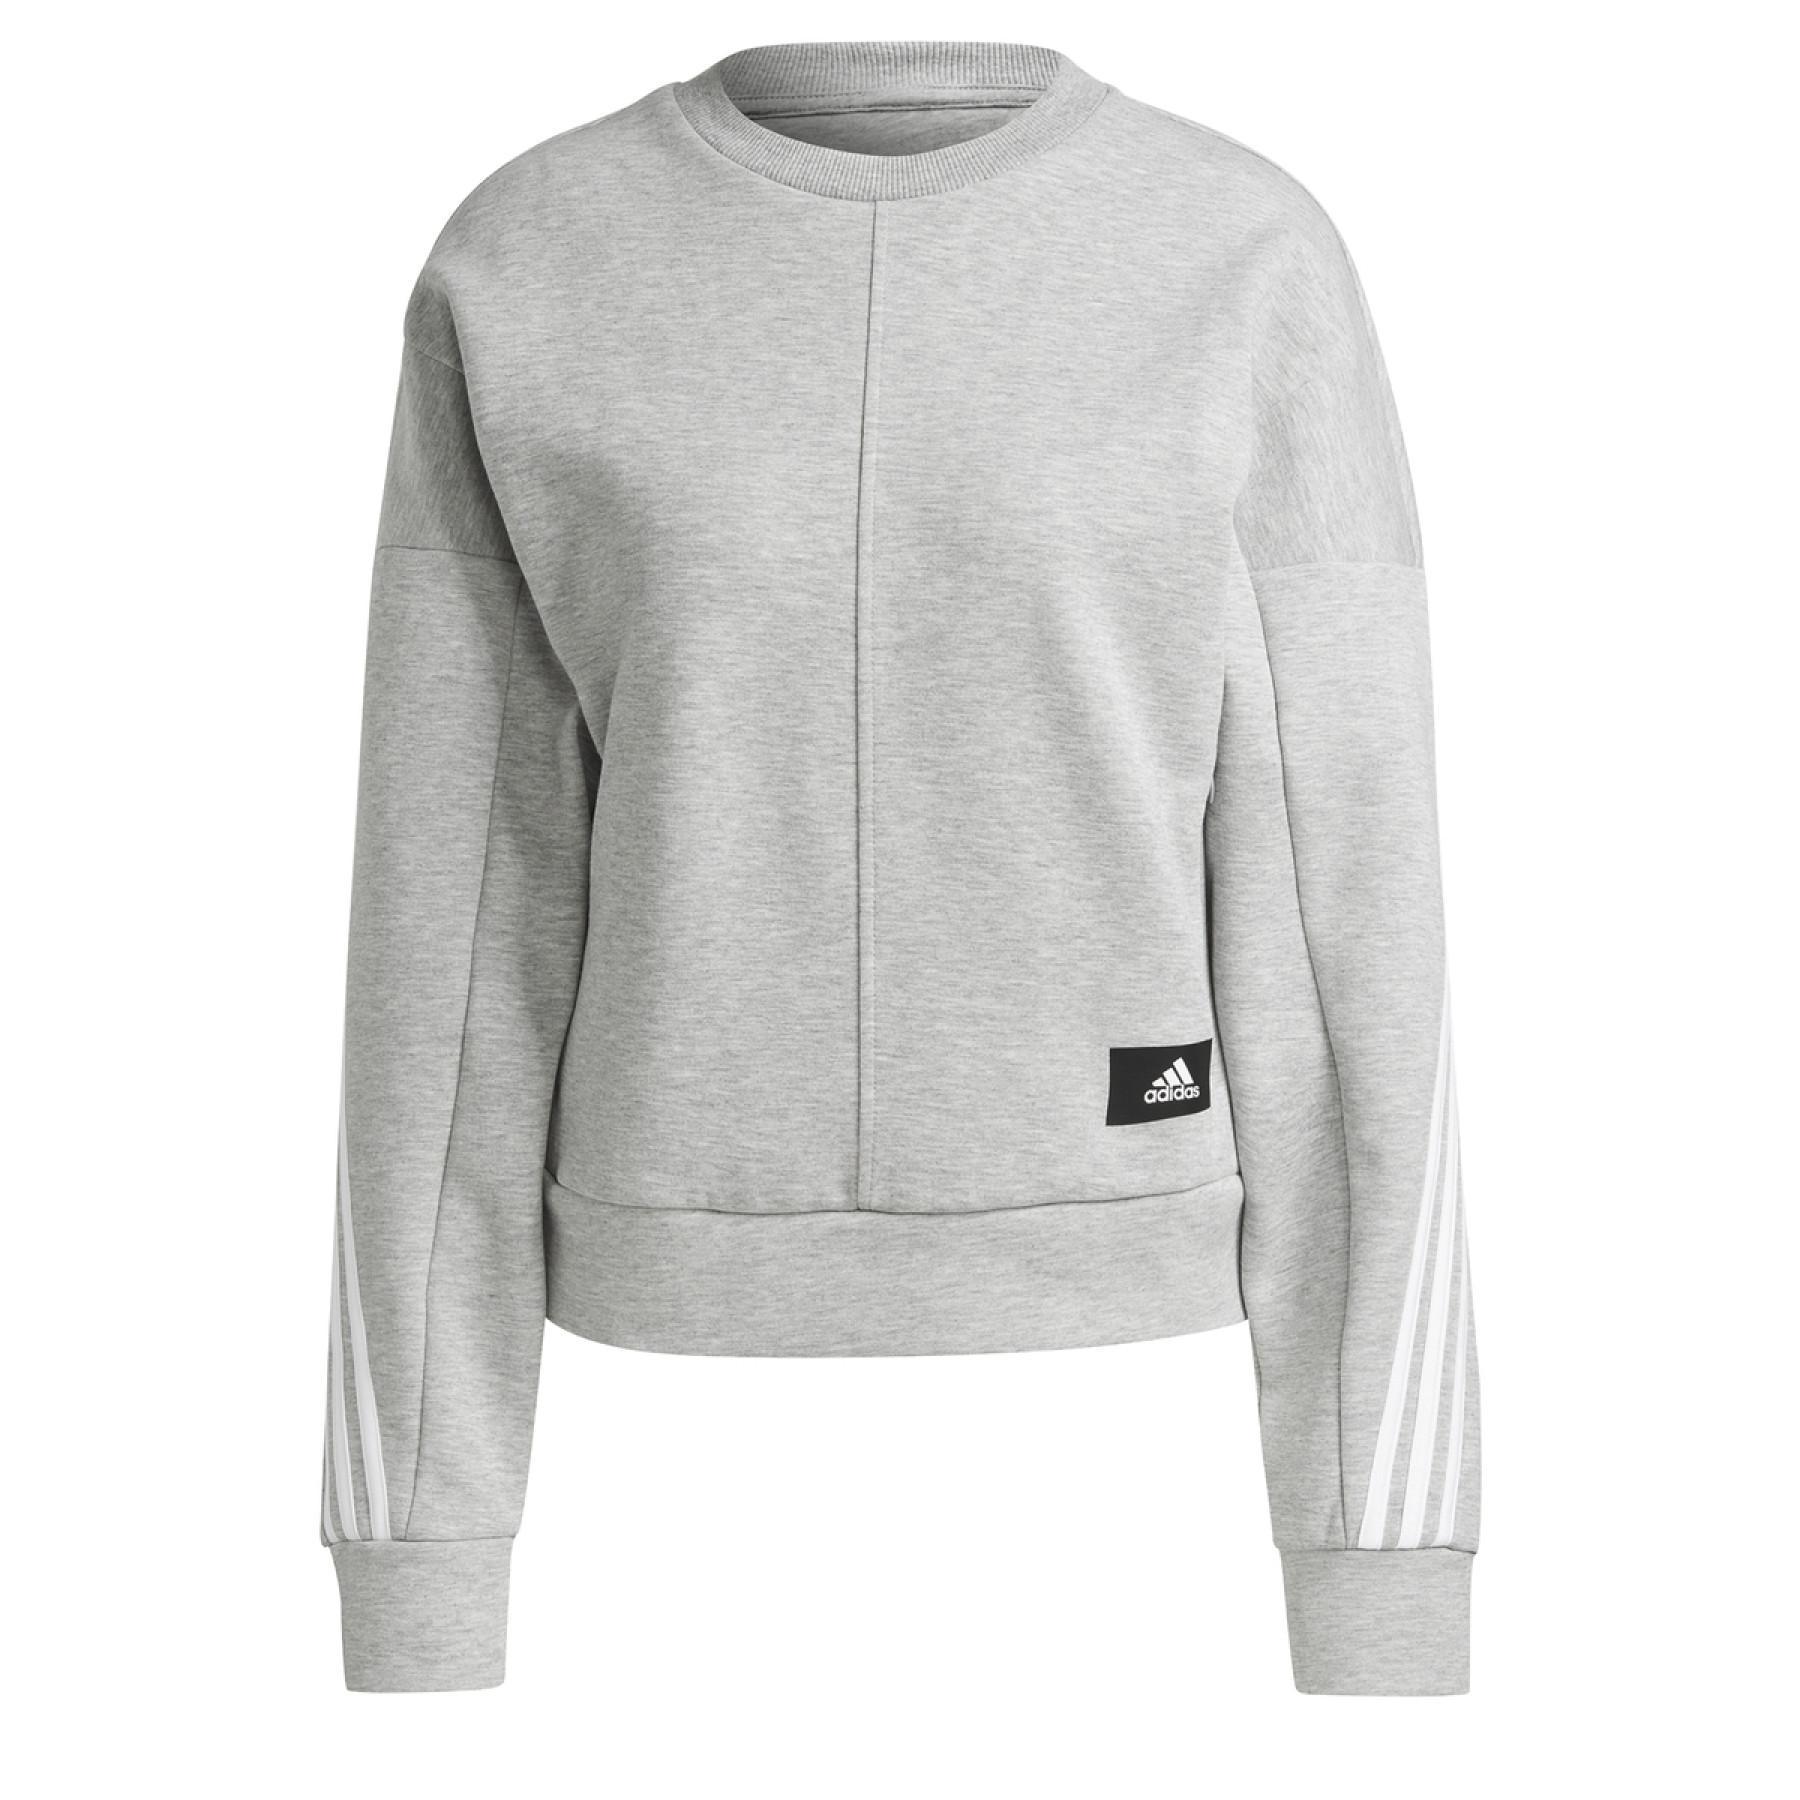 Sweatshirt woman adidas Sportswear Wrapped 3-Bandes